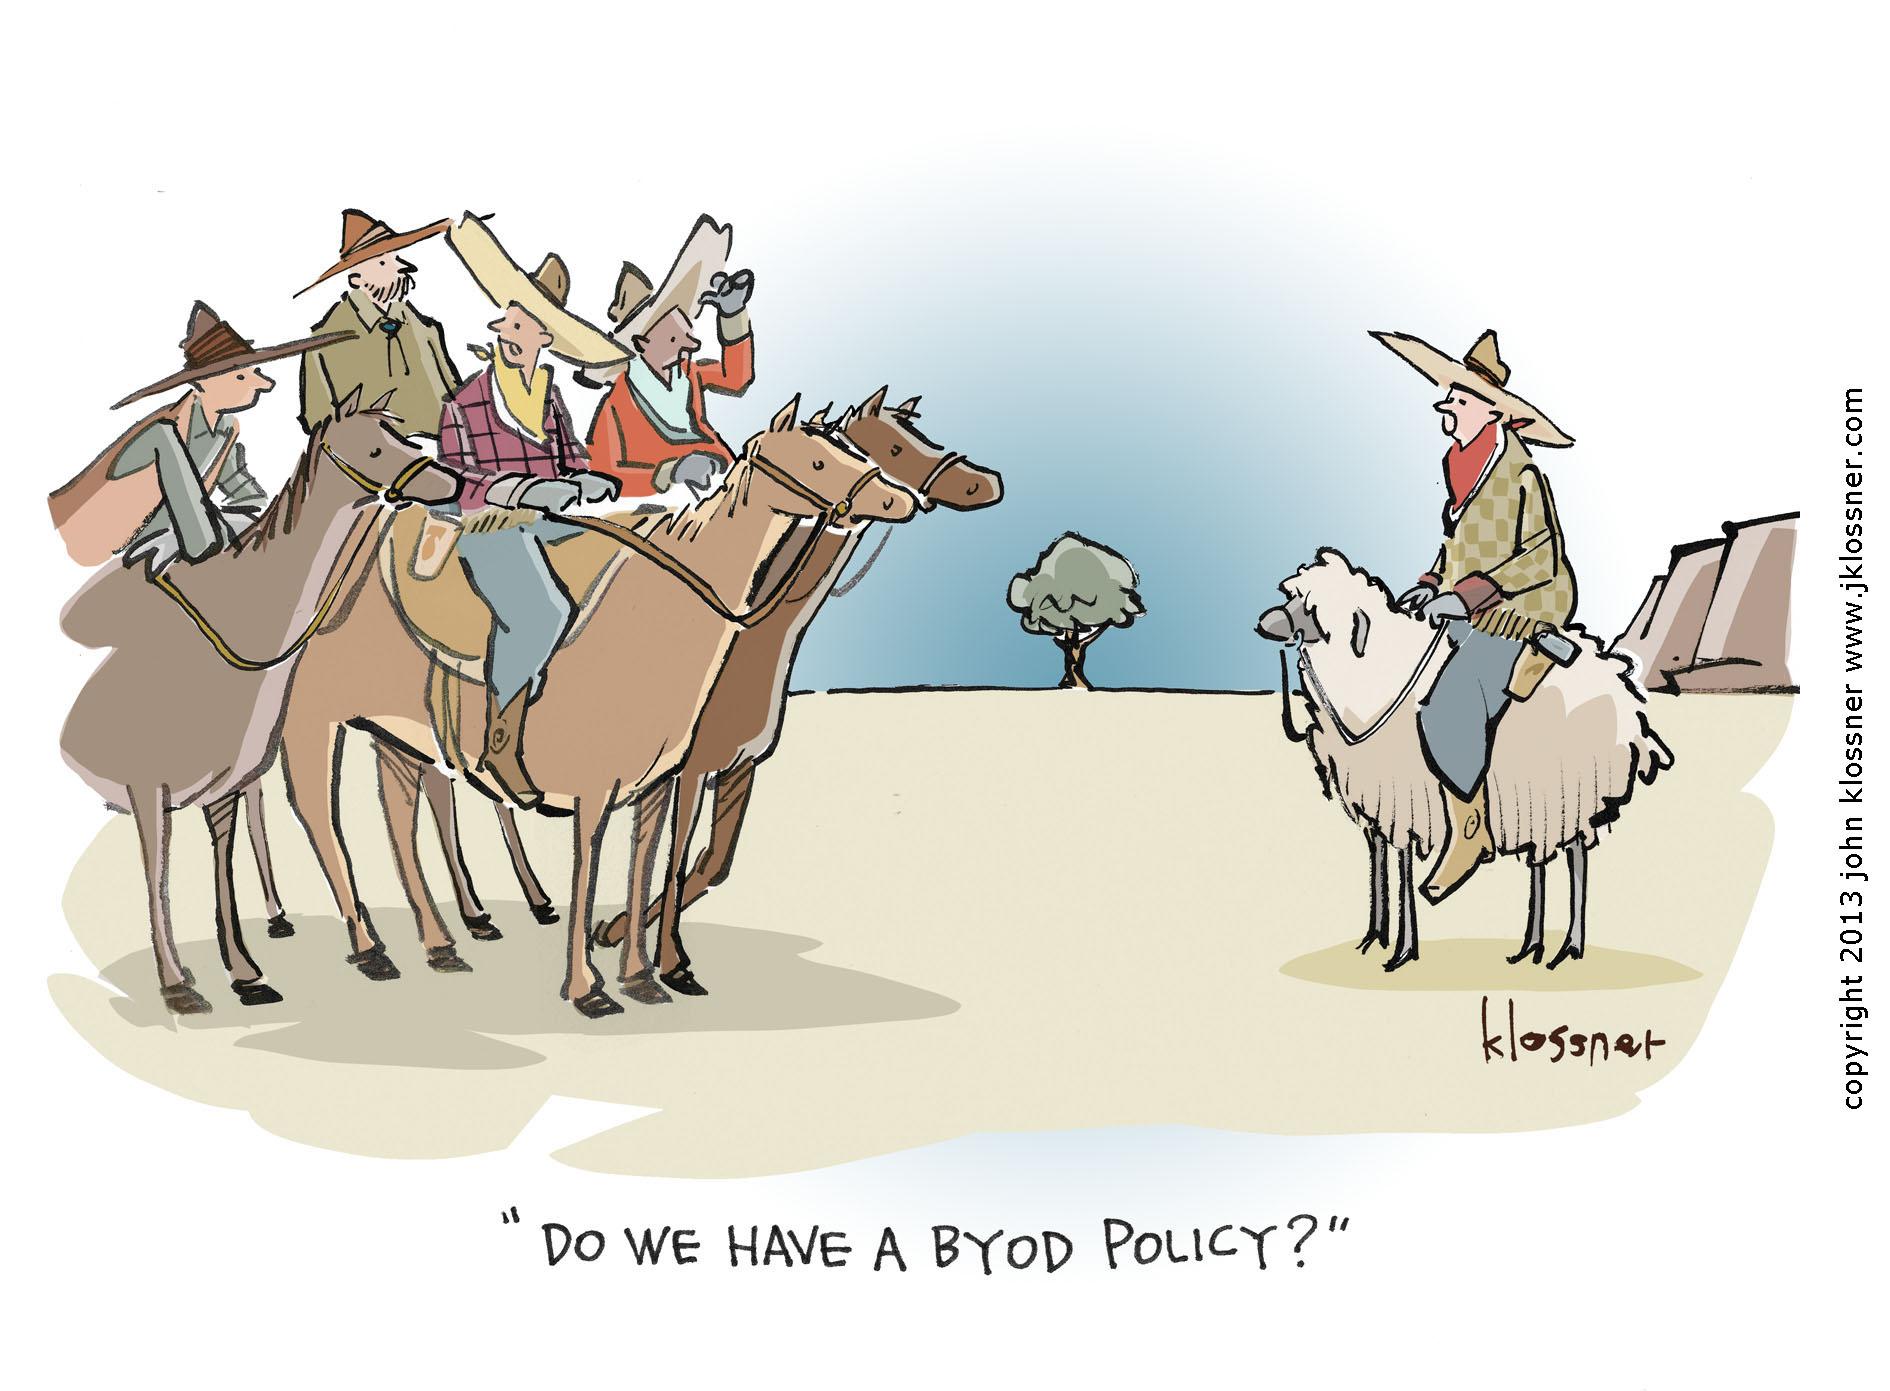 BYOD policy